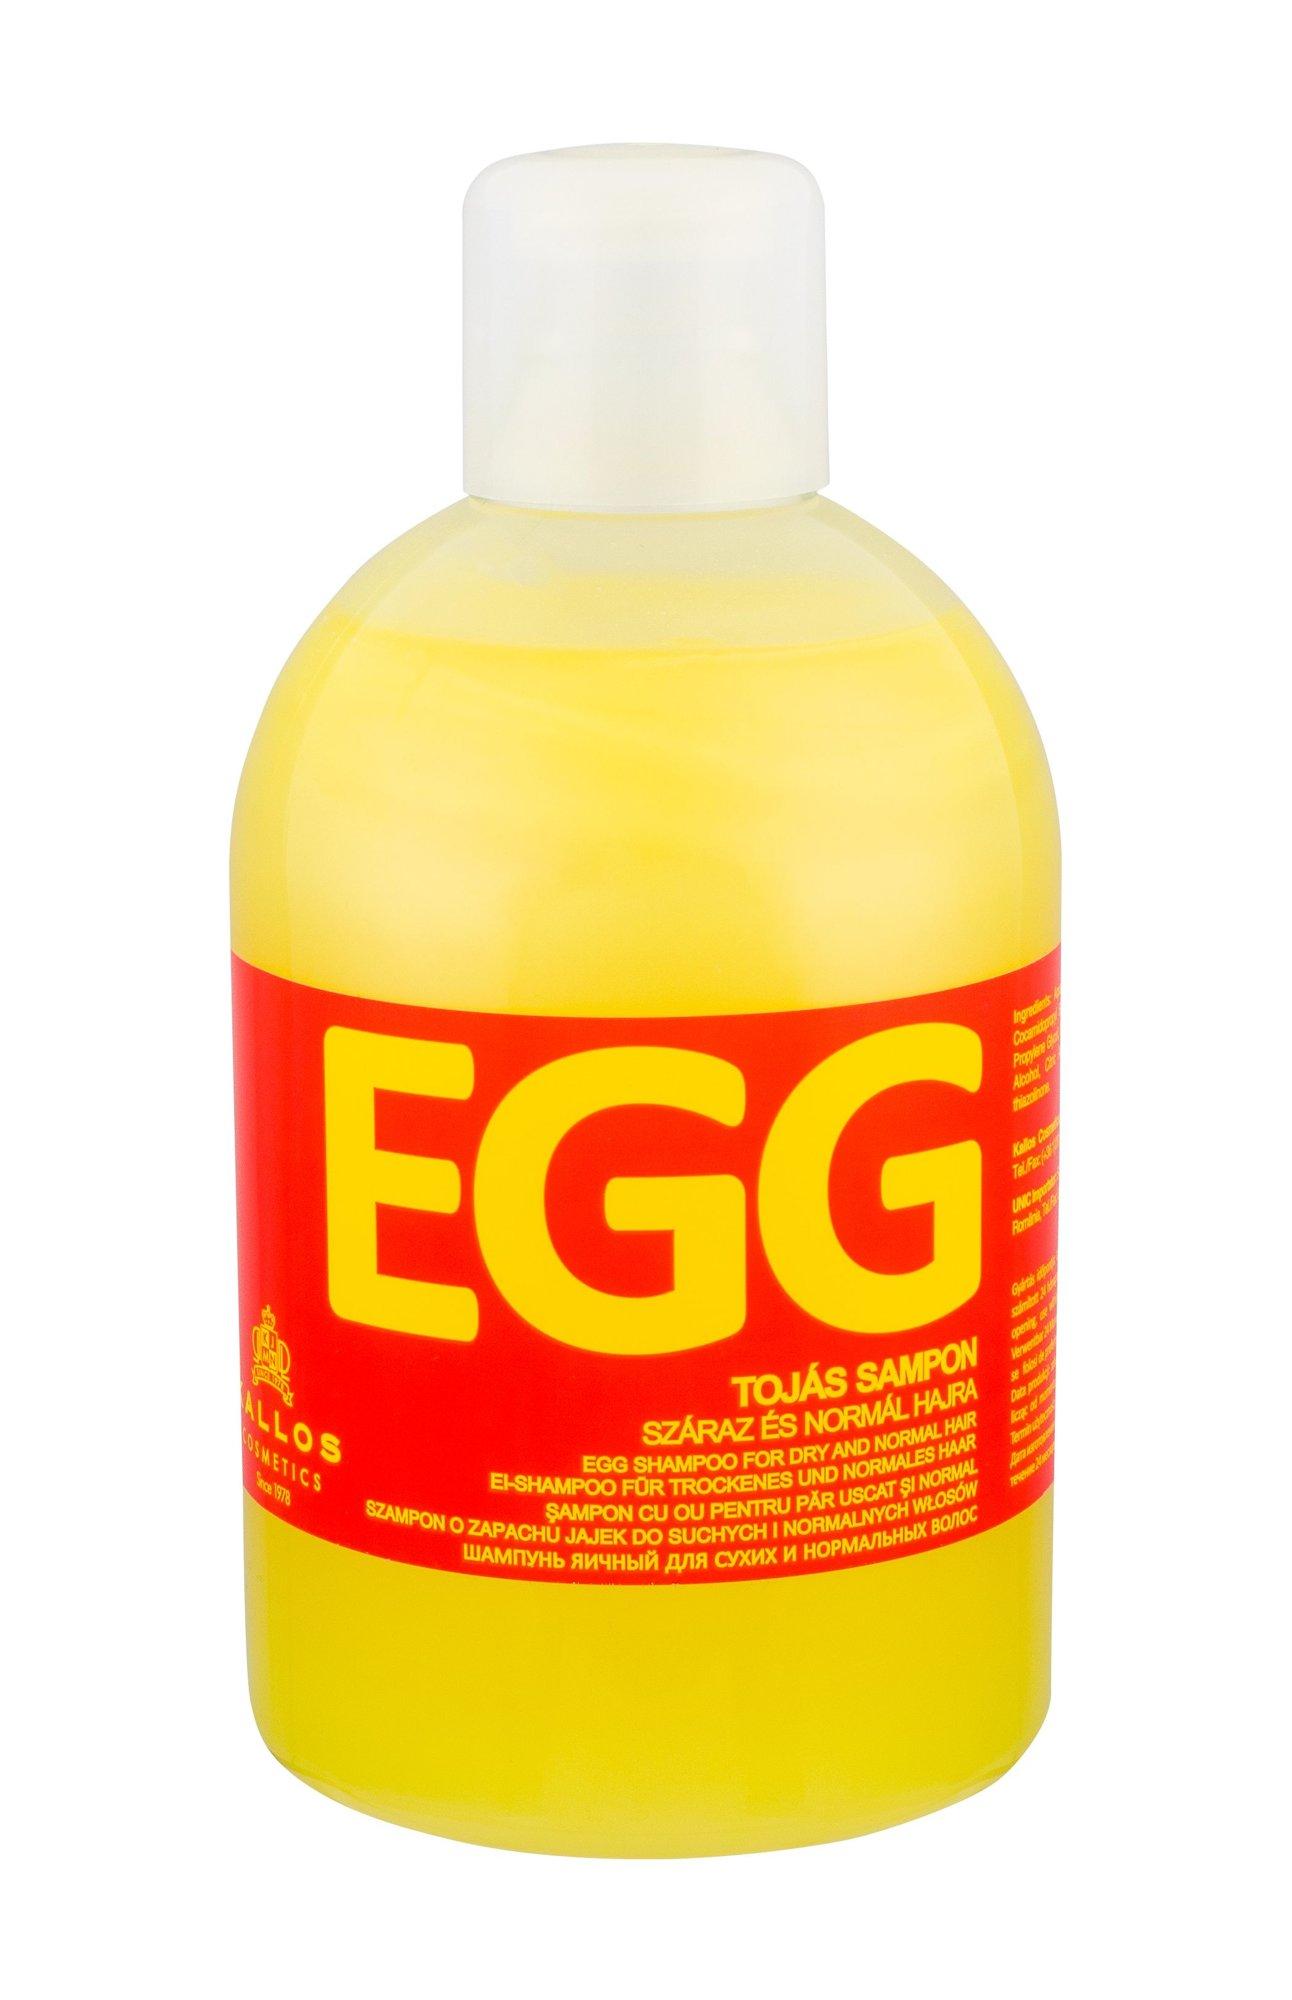 Kallos Cosmetics Egg Shampoo 1000ml